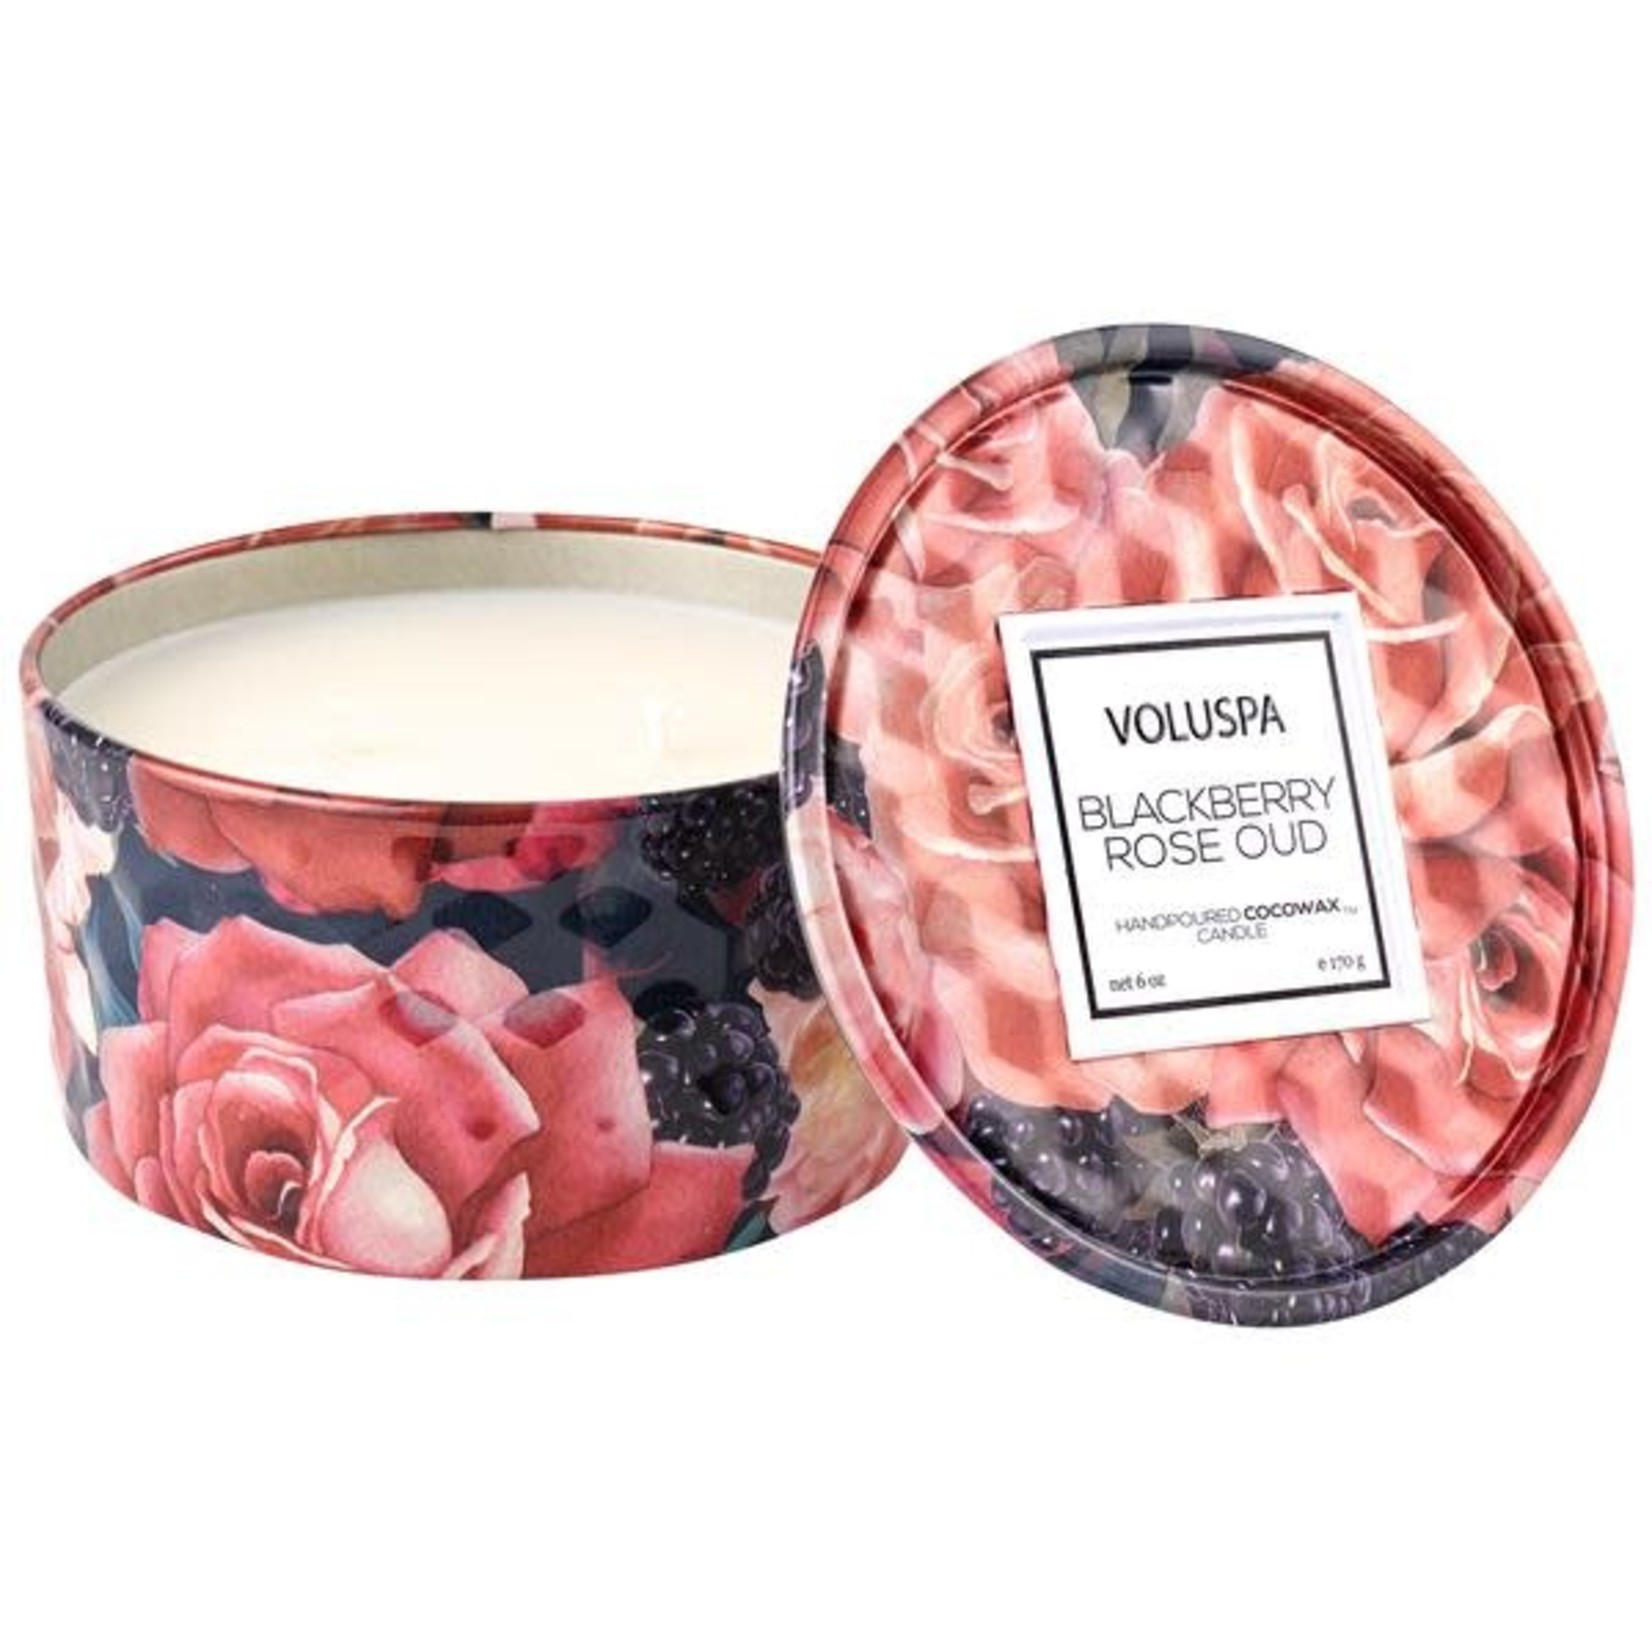 Voluspa Blackberry Rose Oud 6 oz Mini Tin Candle